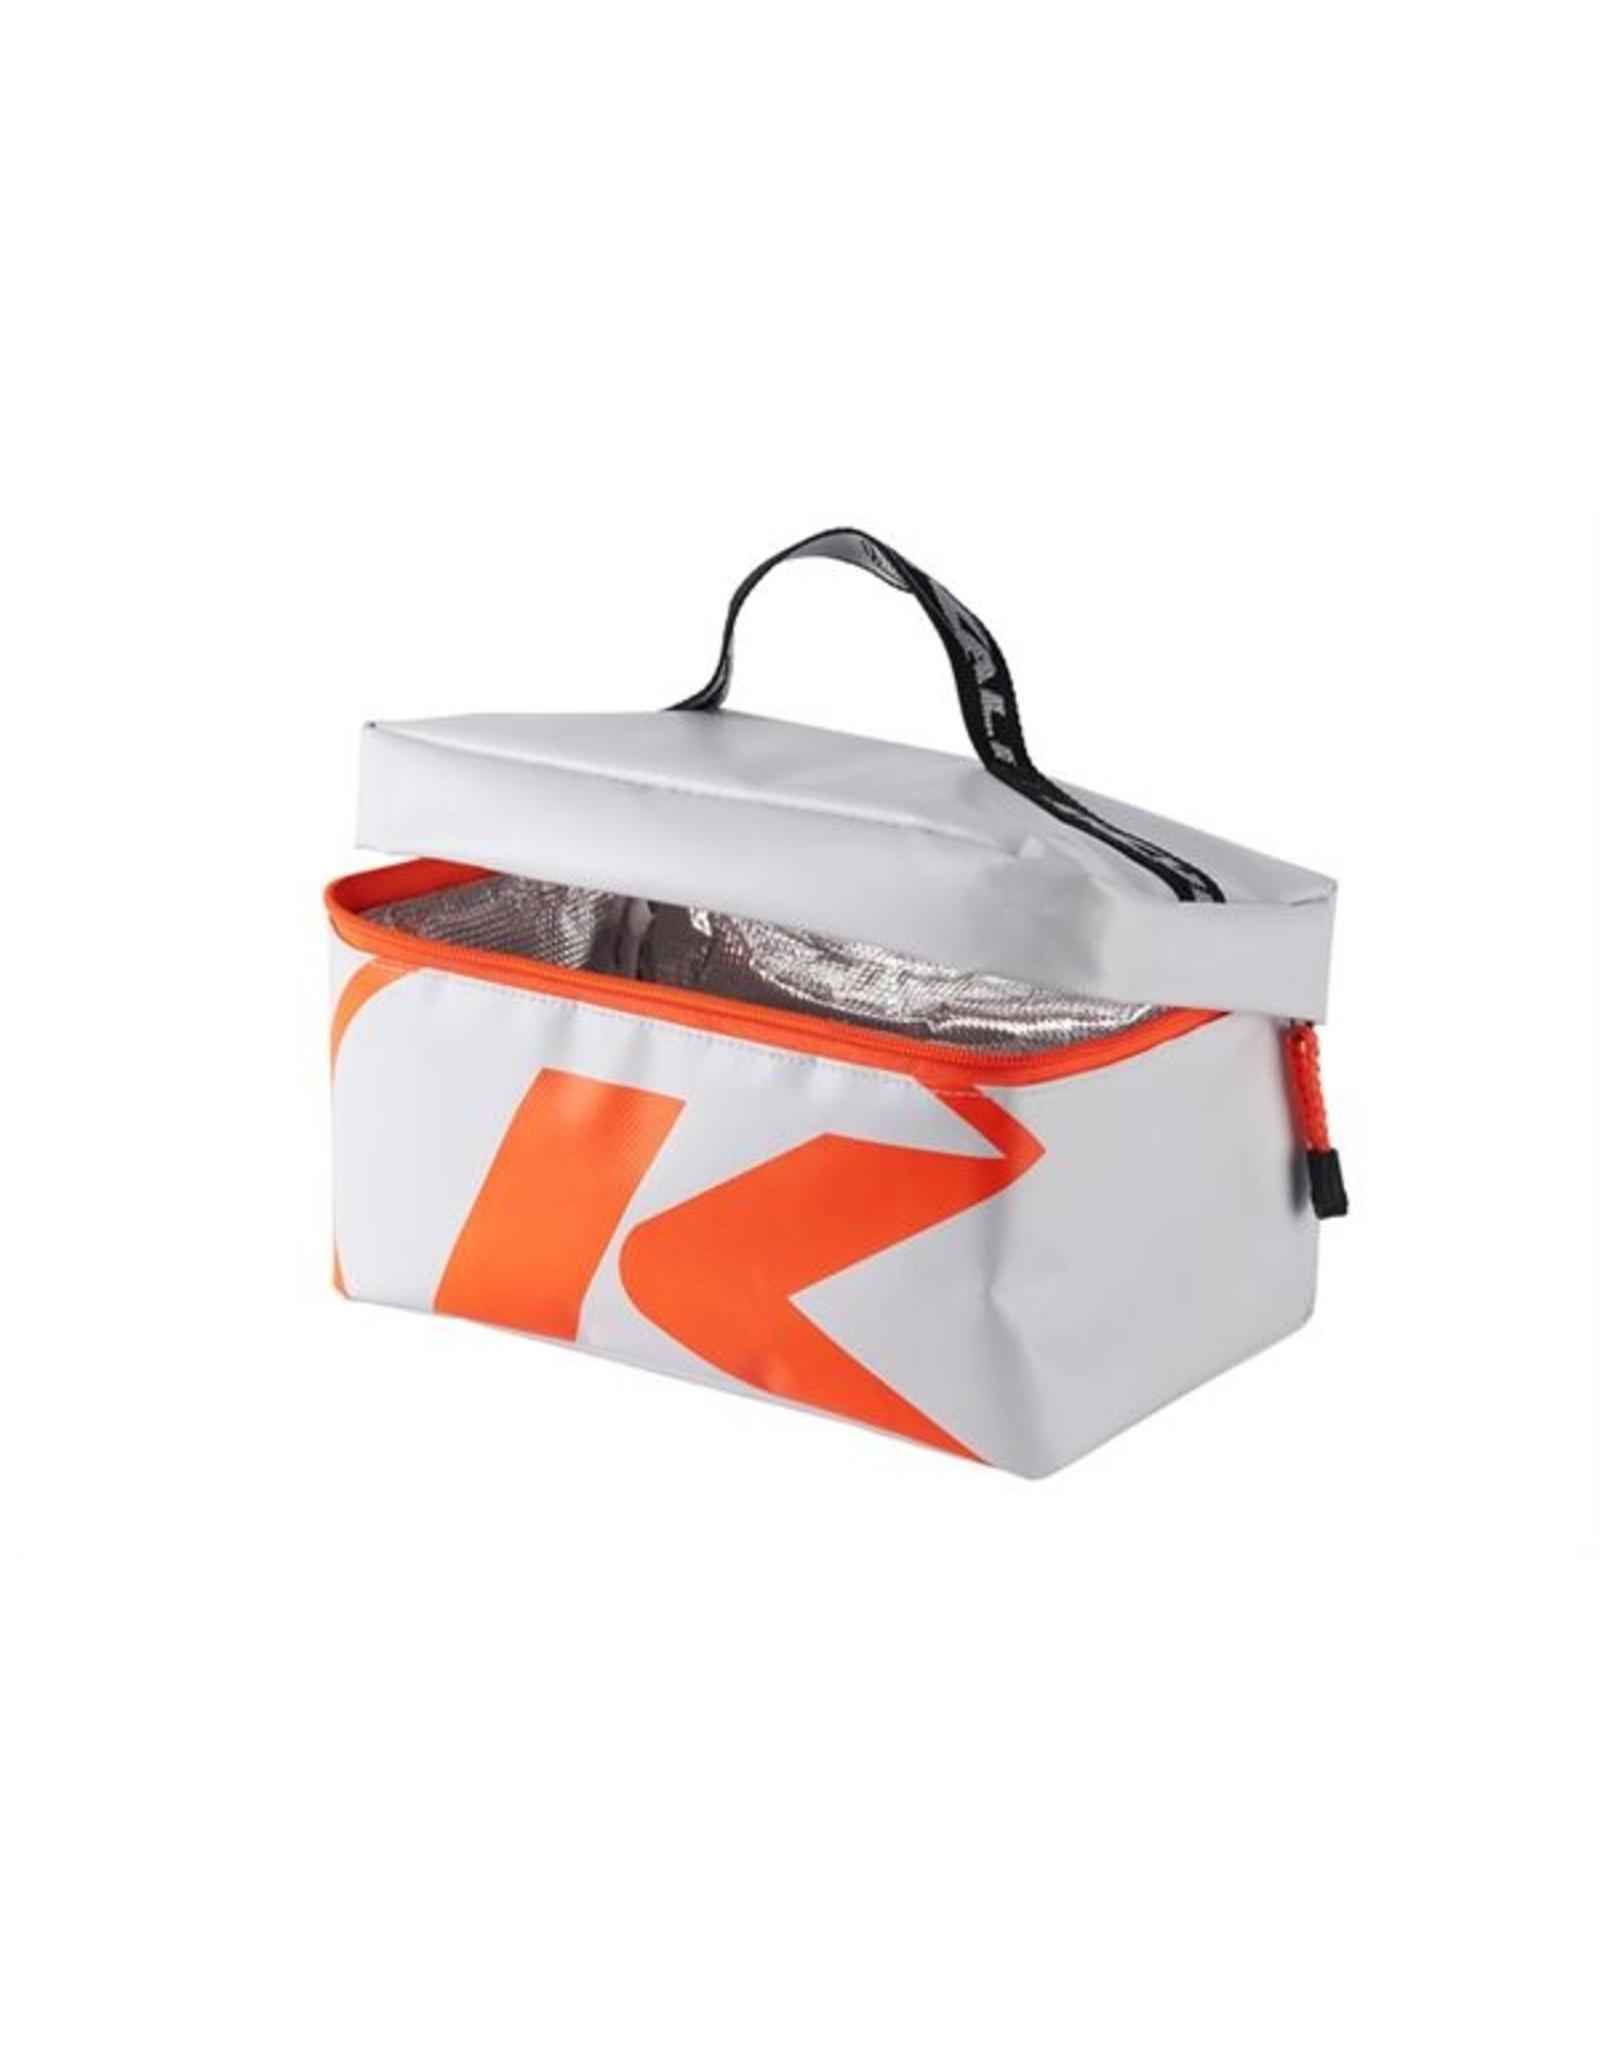 Kali Kunnan Kali Kunnan Cool Bag